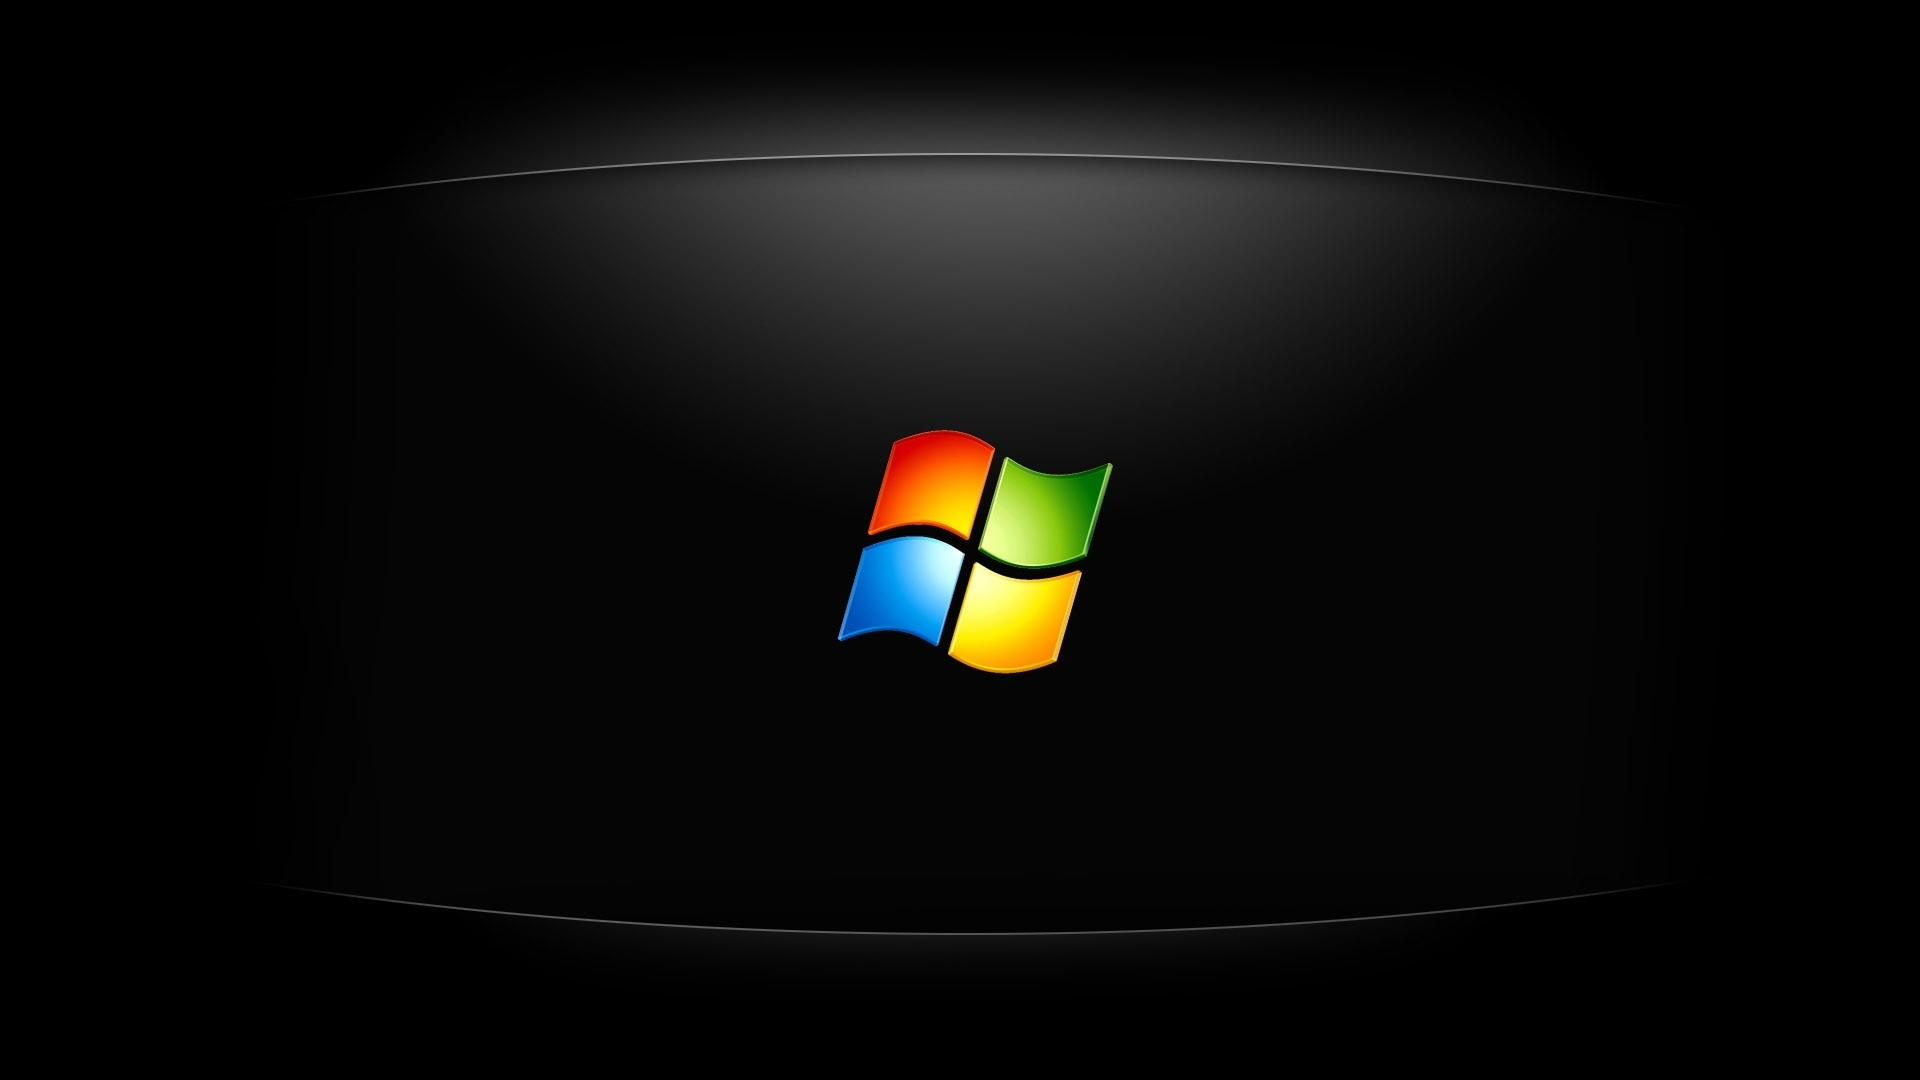 Sfondi full hd desktop nero 86 immagini for Sfondi full hd pc